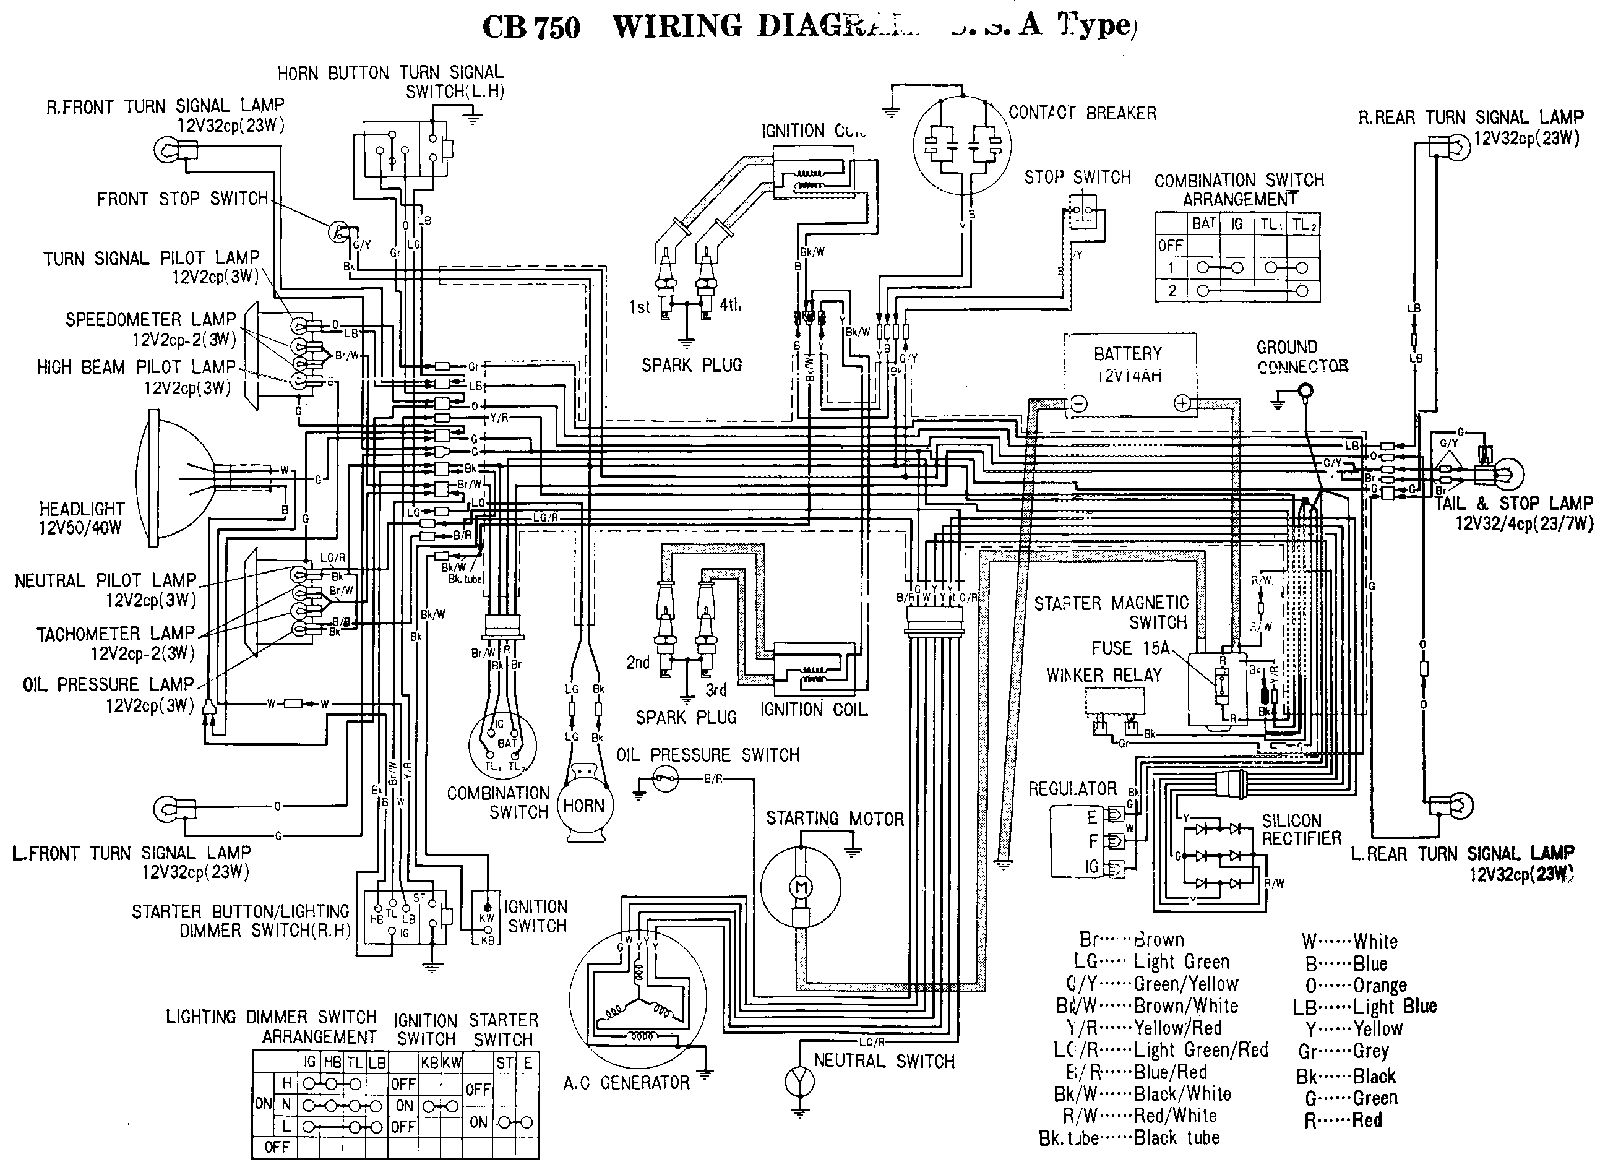 honda cb750 chopper wiring diagram wm 5945  picture 6 of 6 from honda cb750 wiring diagrams wiring  honda cb750 wiring diagrams